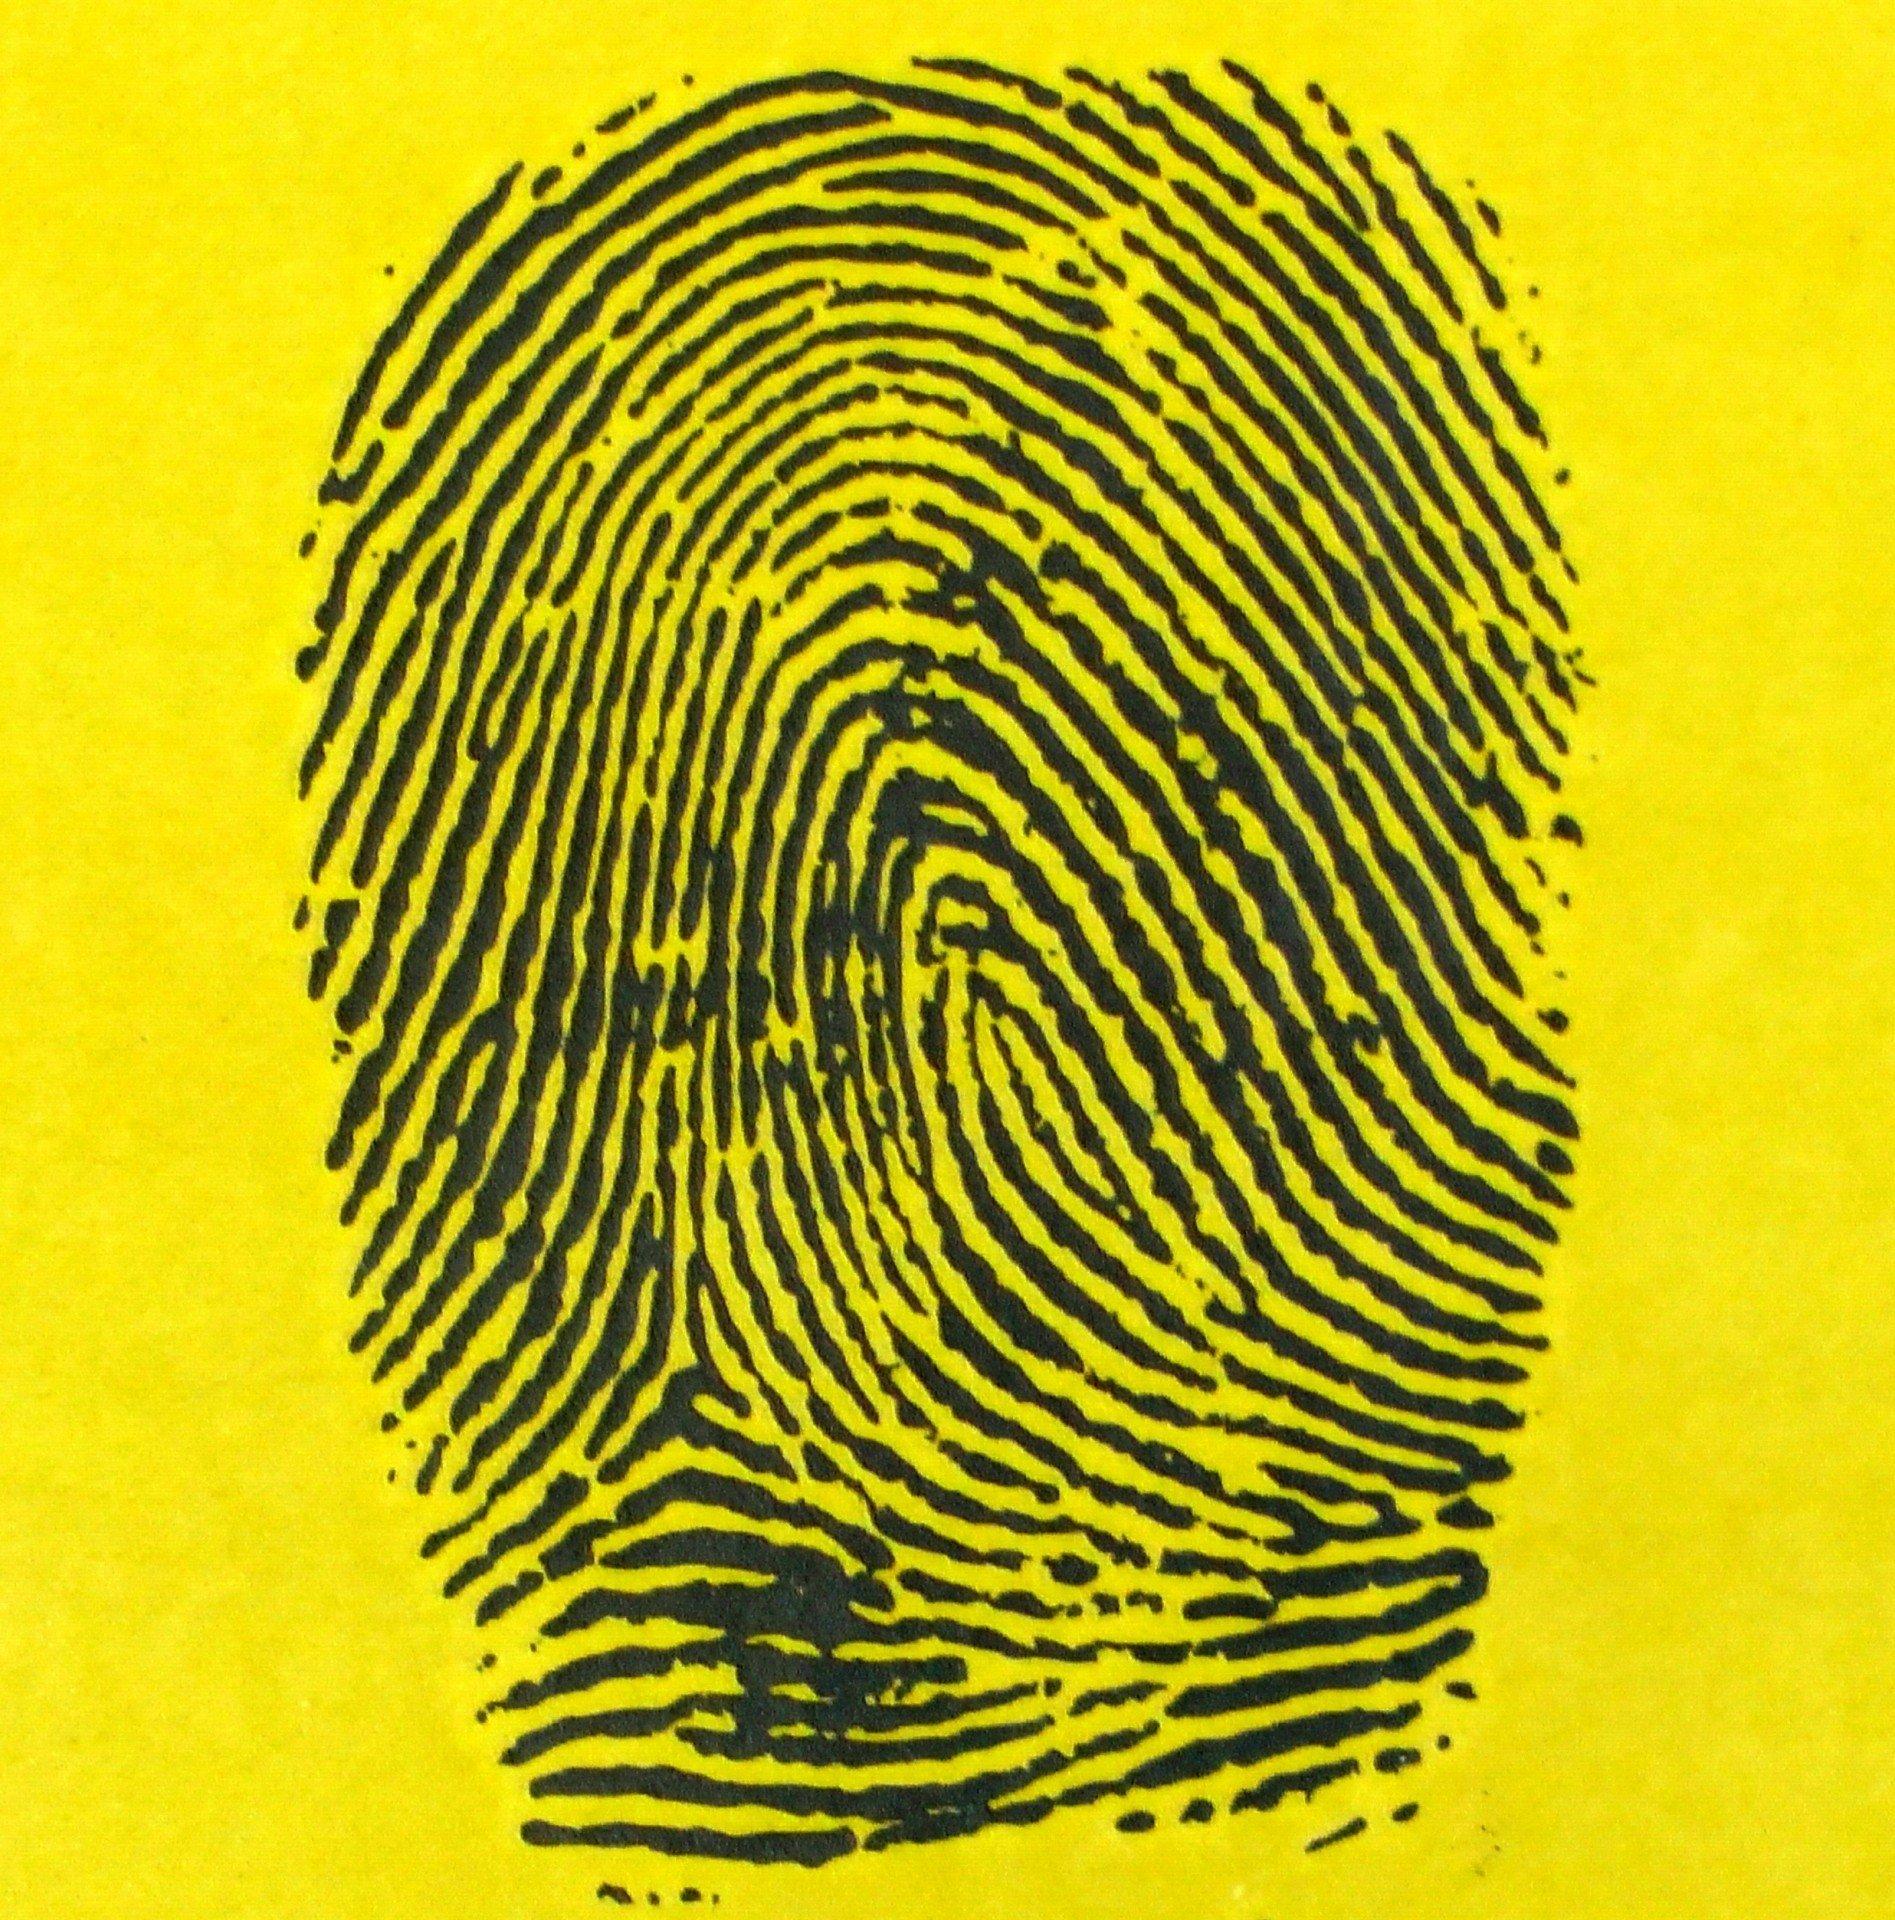 fingerprint on yellow background